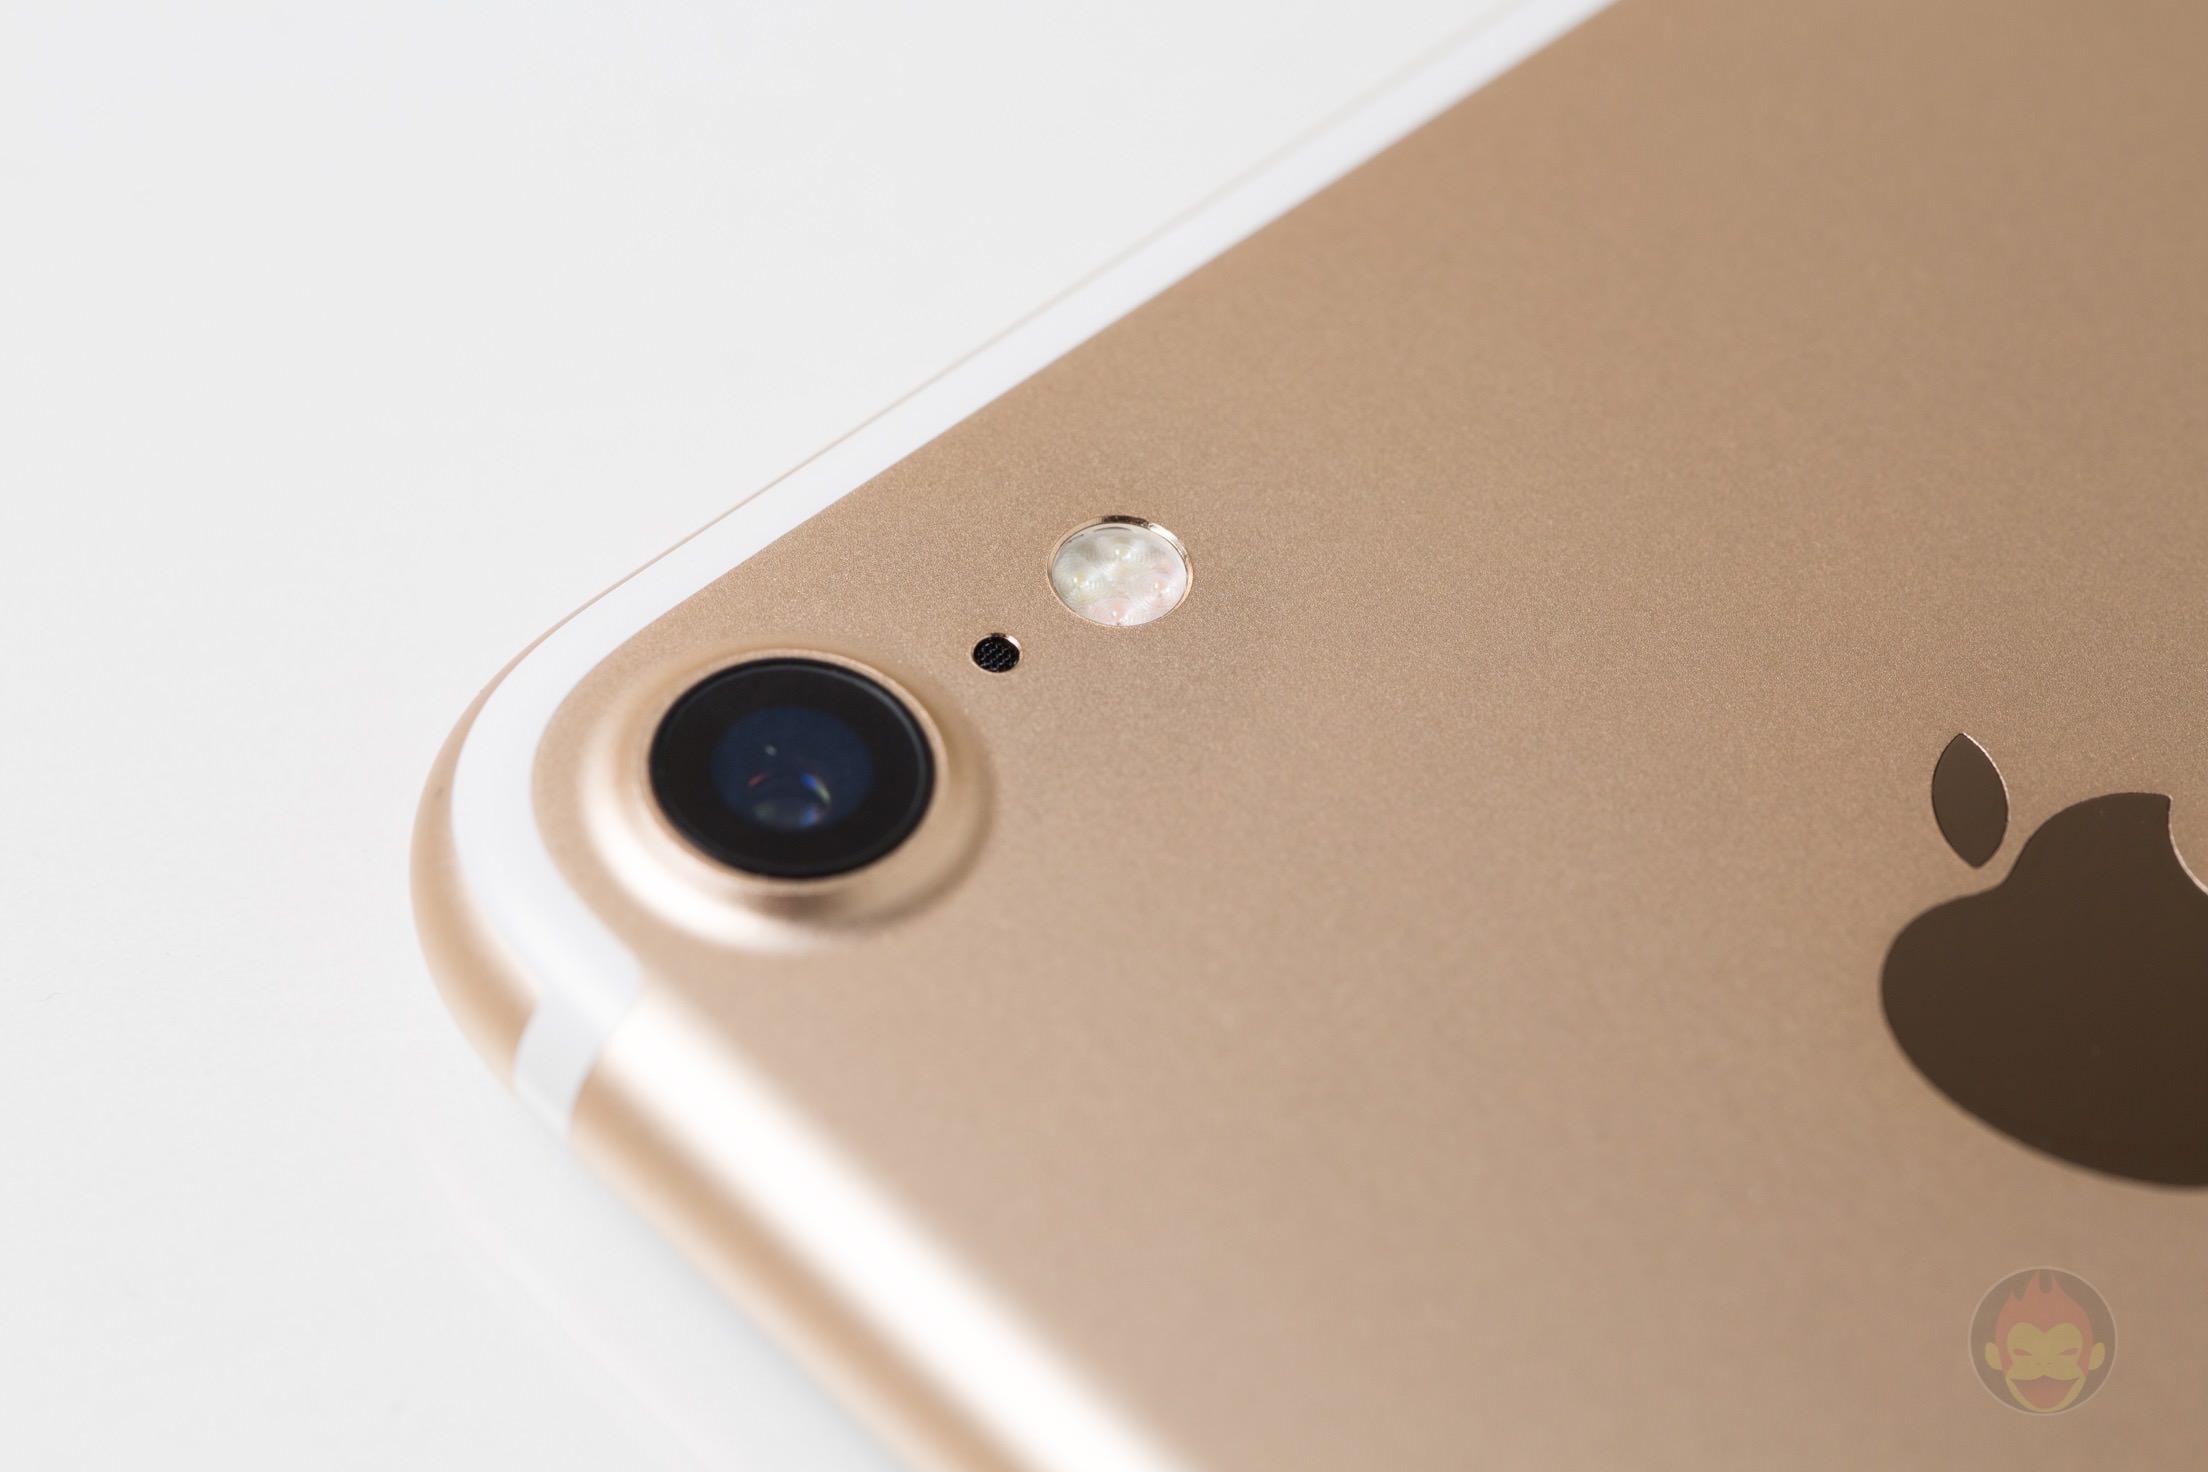 iPhone-7-Gold-Model-13.jpg